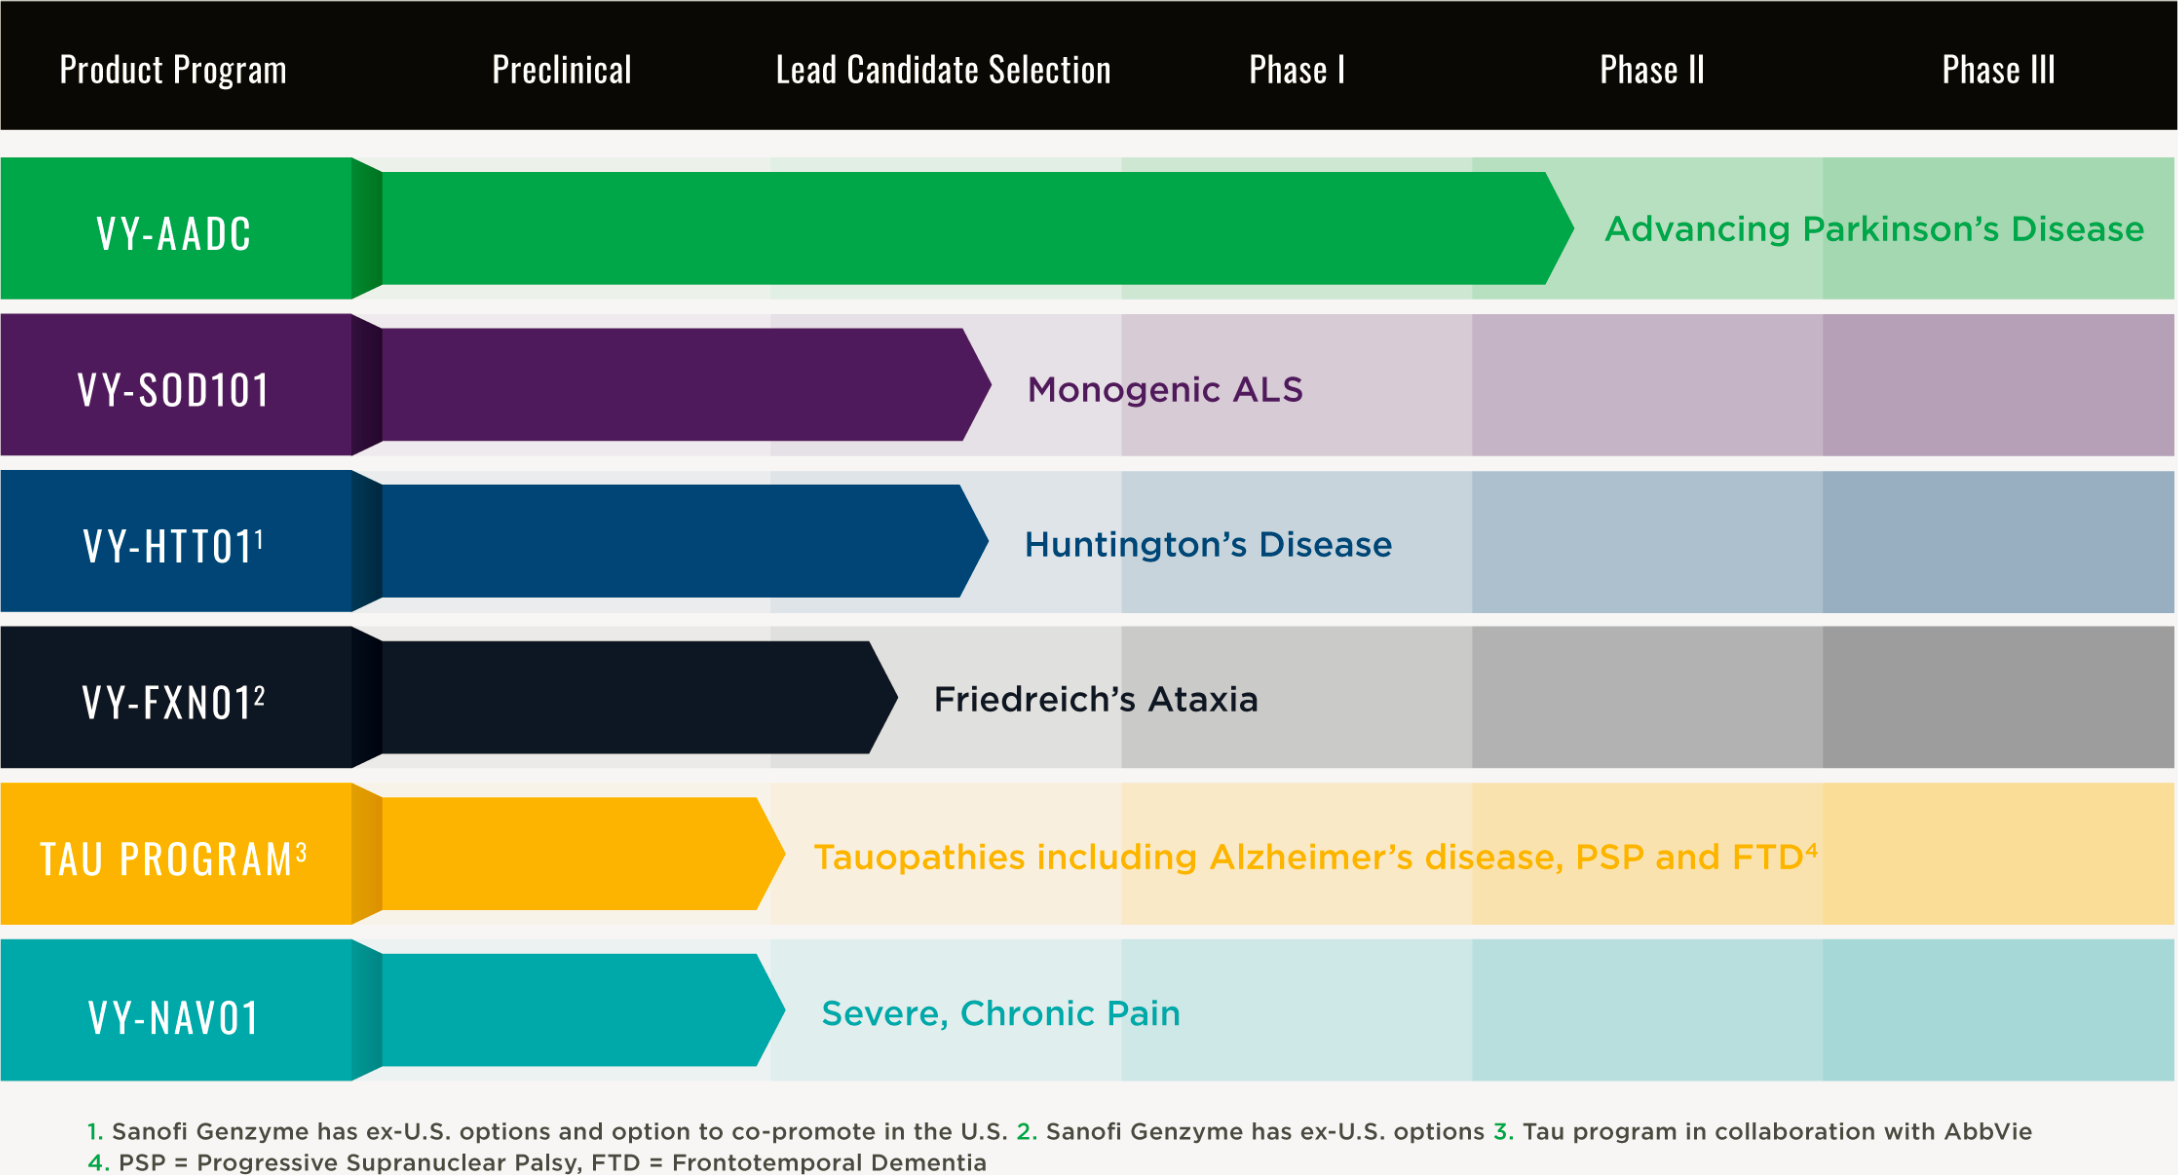 voyager therapeutics pipeline - Neurocrine и Voyager: генная терапия болезни Паркинсона